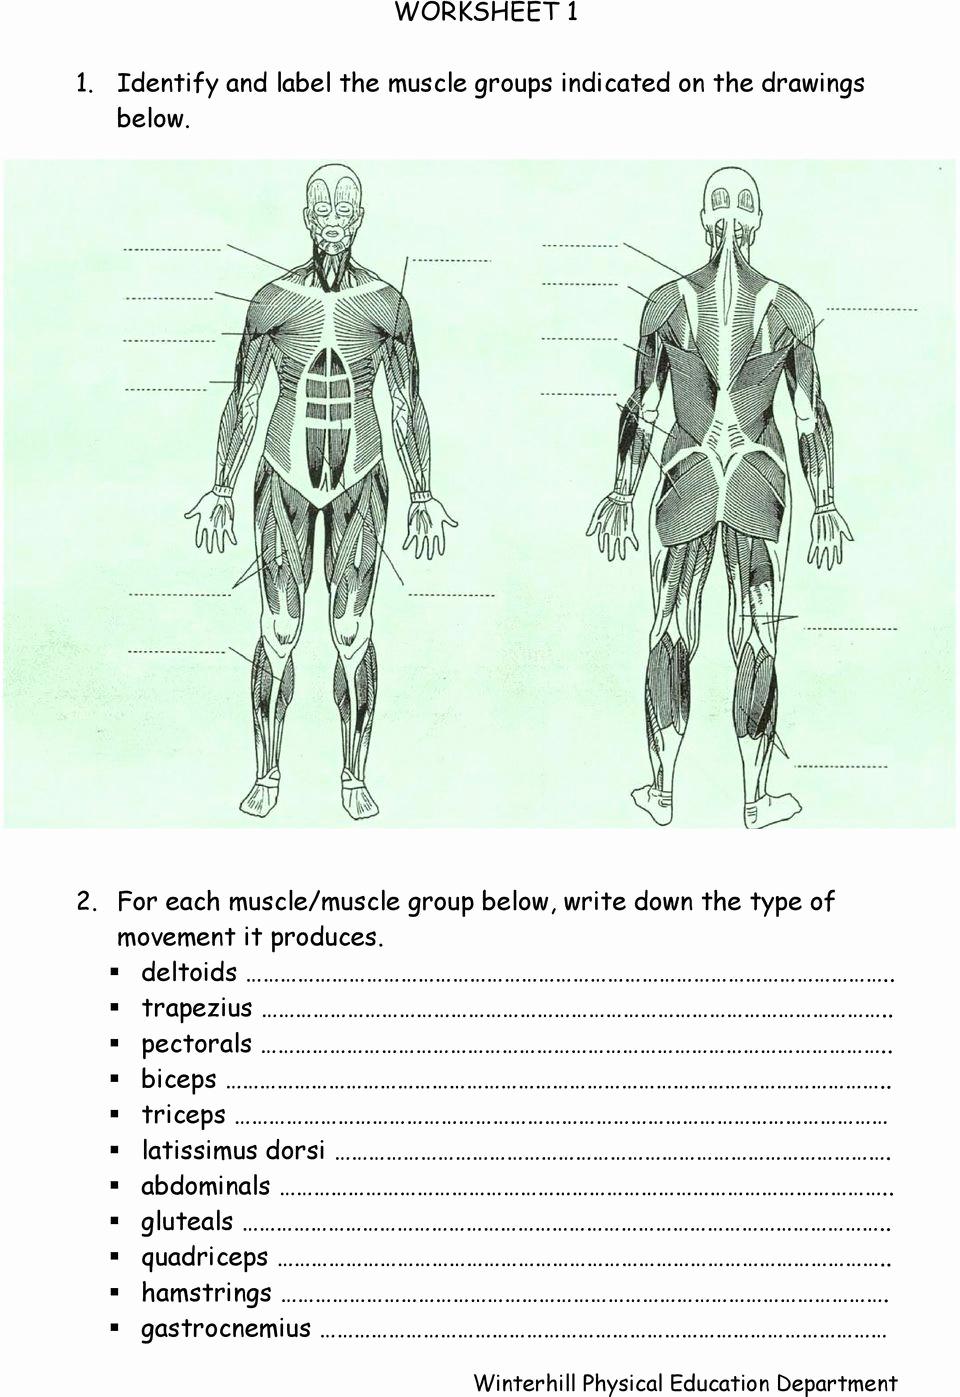 Muscle Diagram Worksheets Awesome 34 Label Muscular System Worksheet Labels Design Ideas 2020